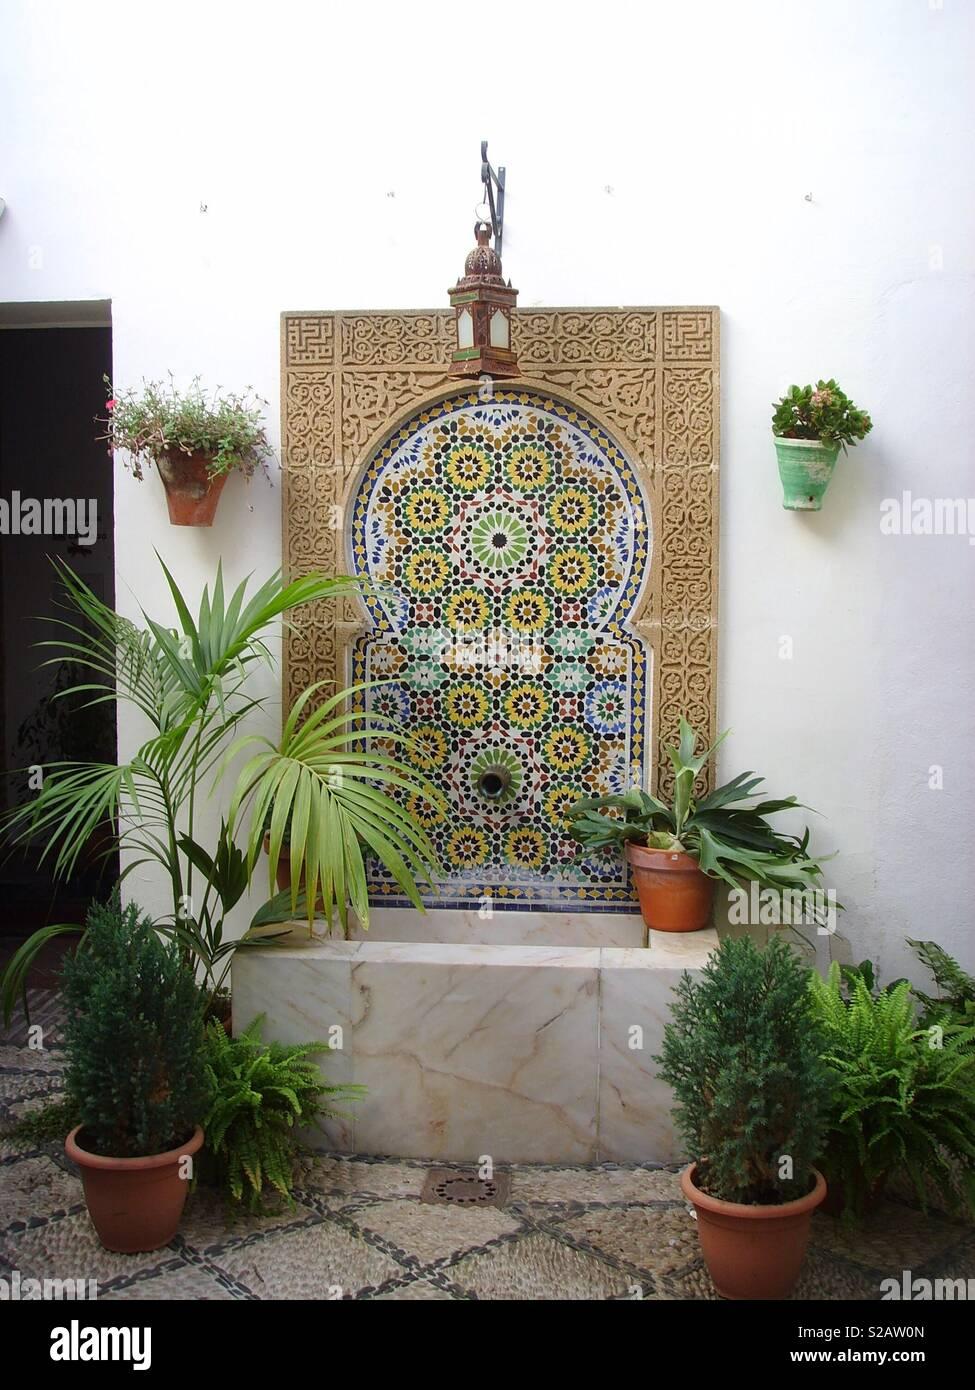 Art islamique Photo Stock